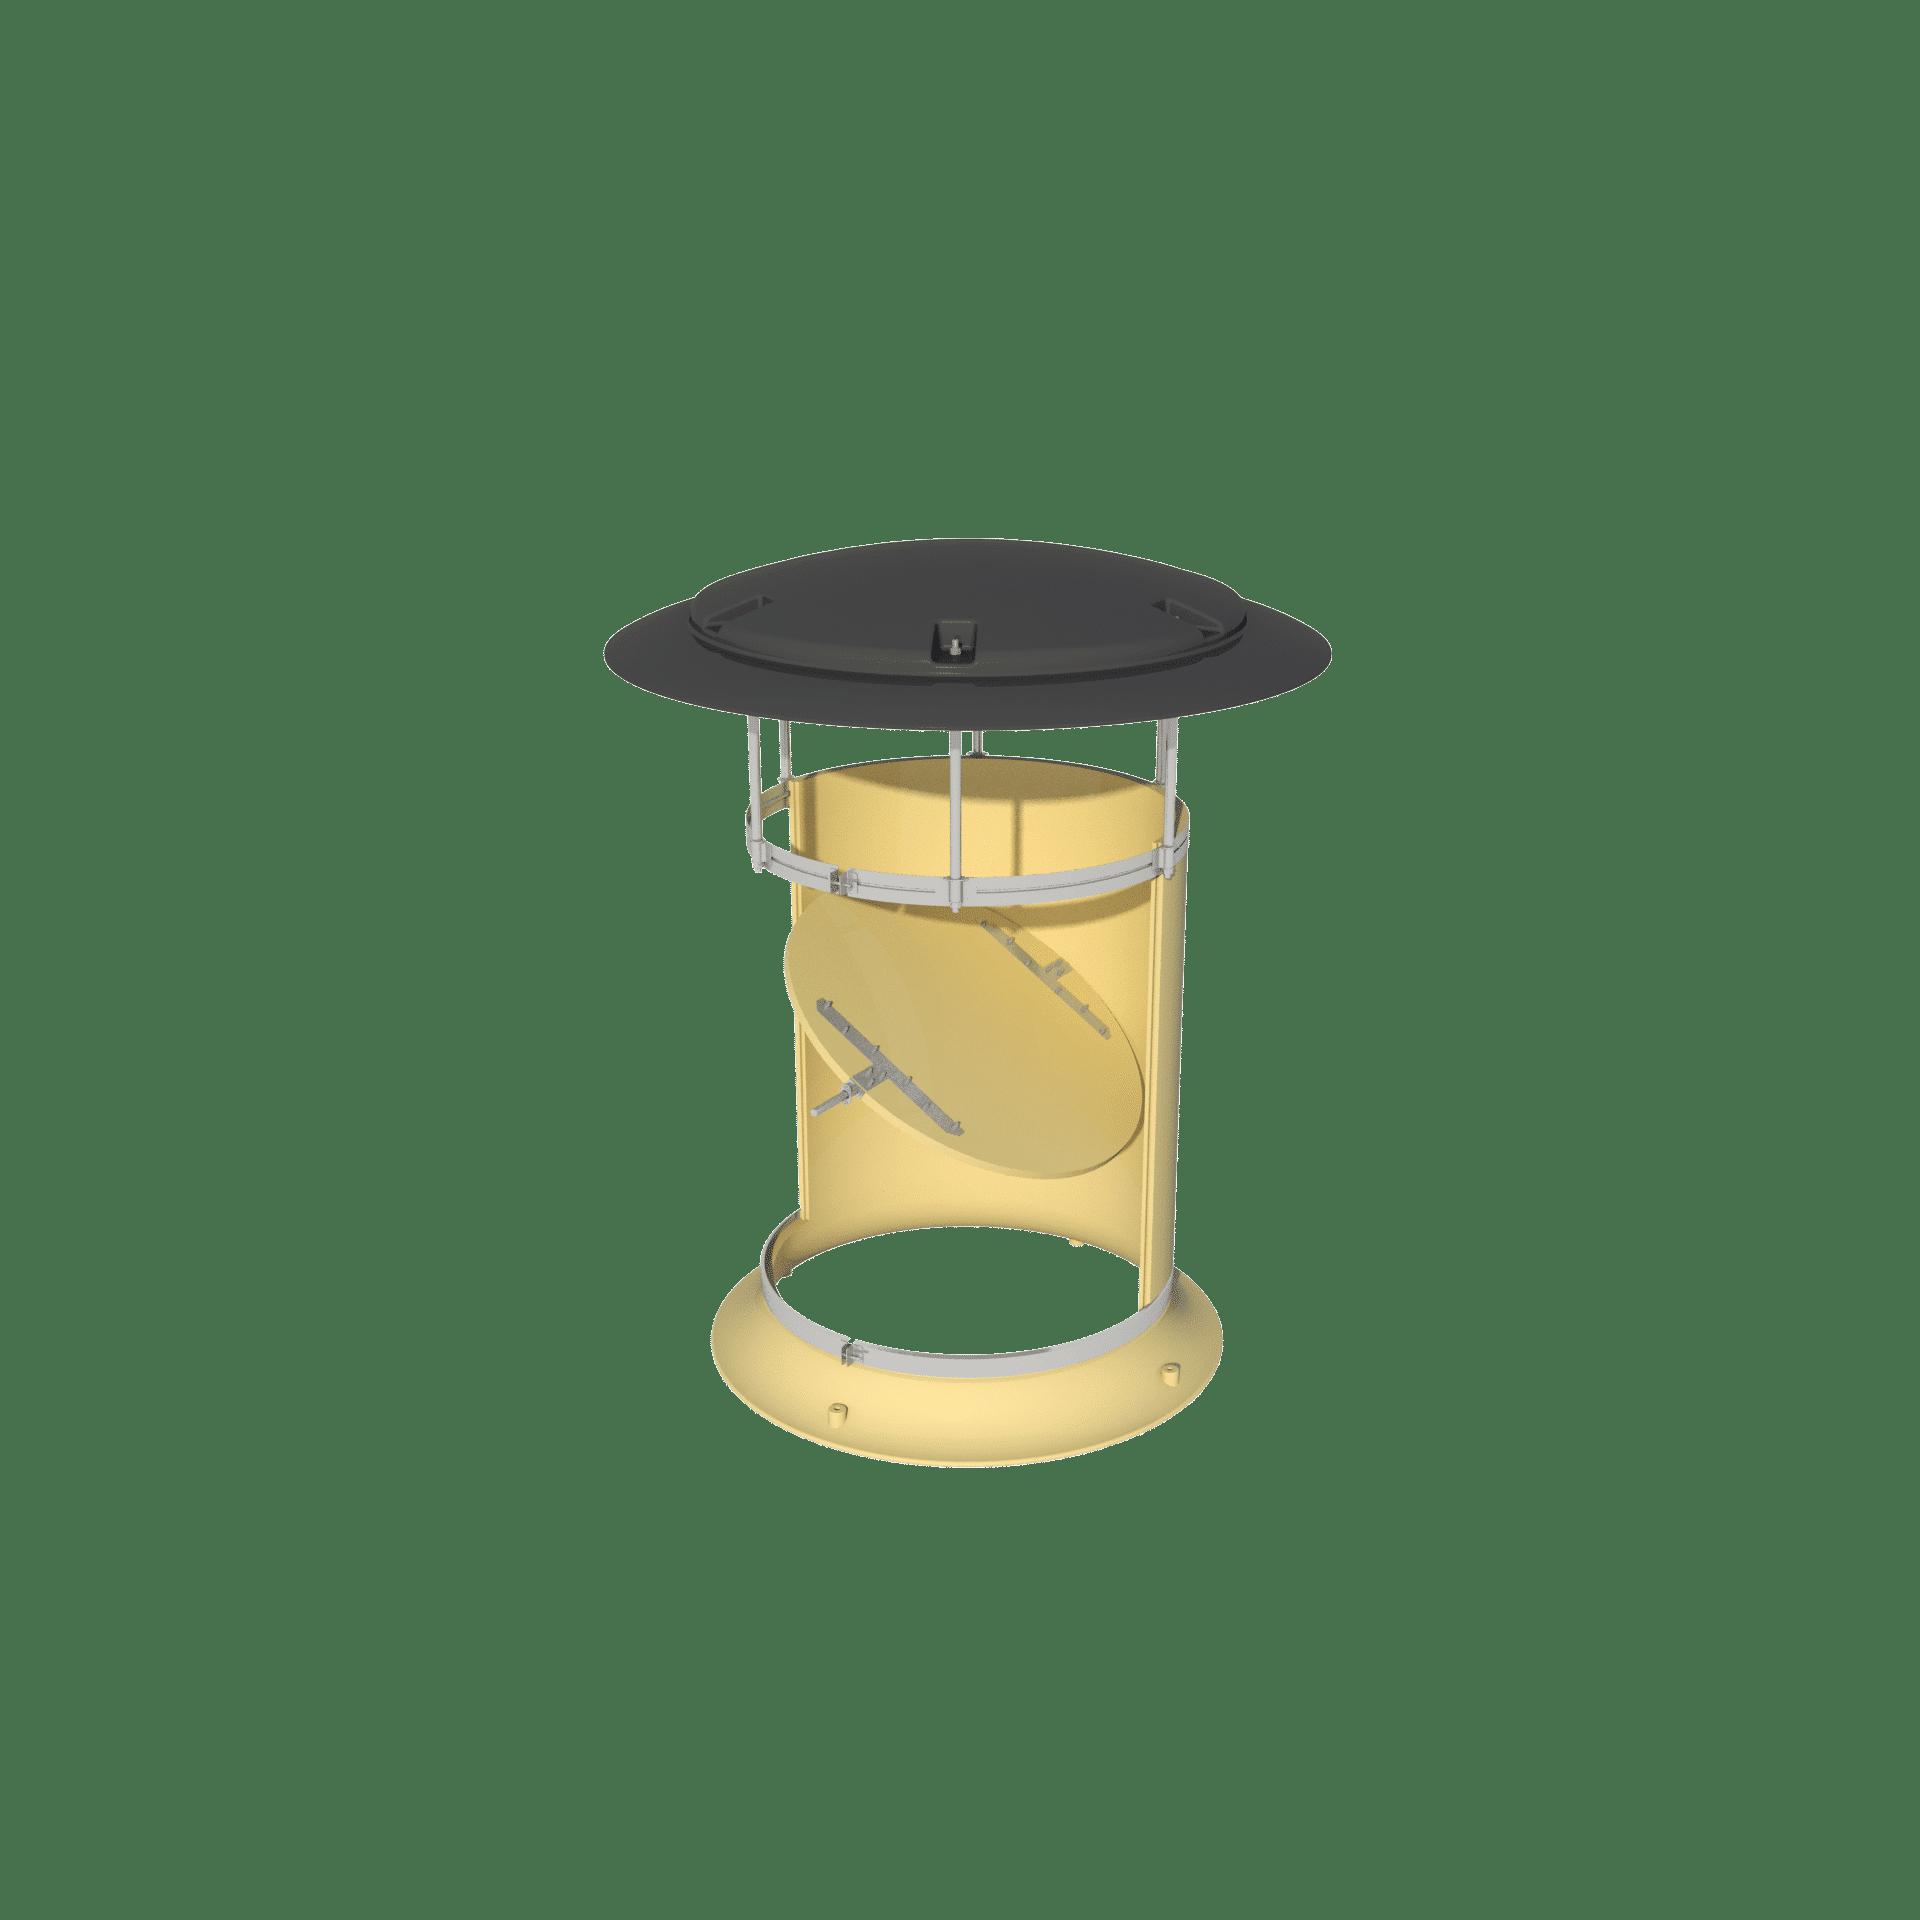 Exhaust chimney with rain cap - TPI-Polytechniek